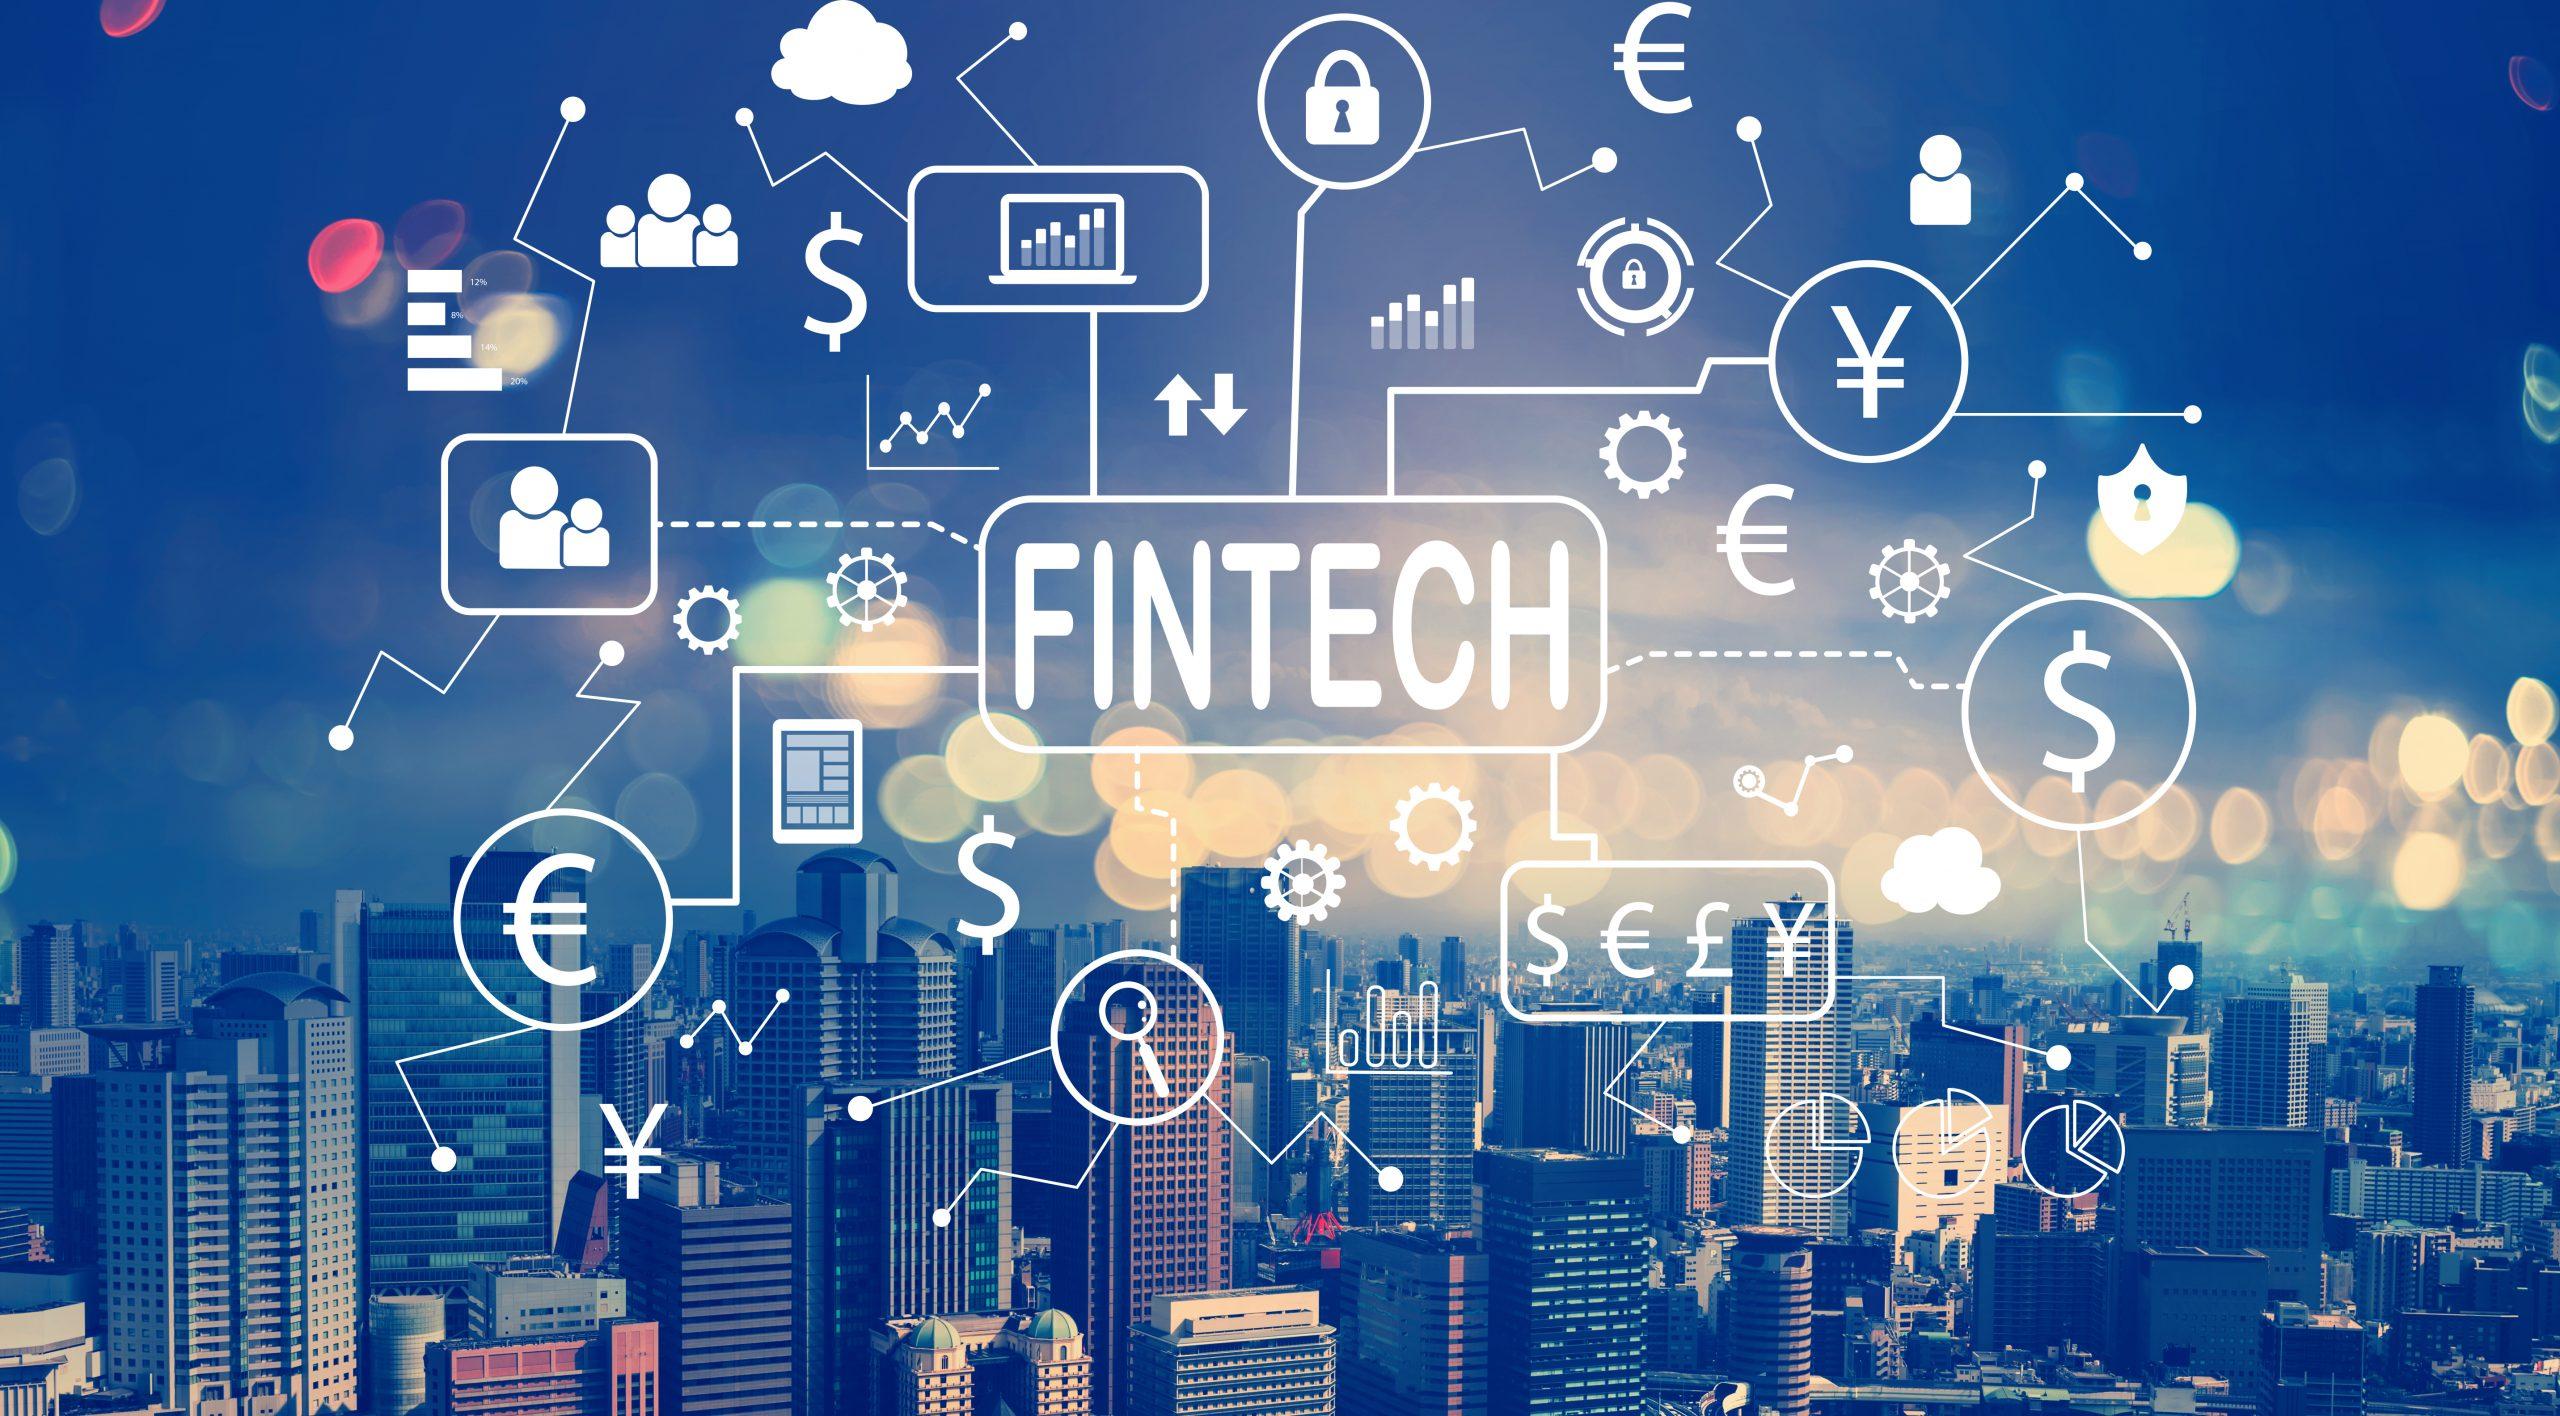 N'Gunu Tiny- Fintech skyrocket 2020